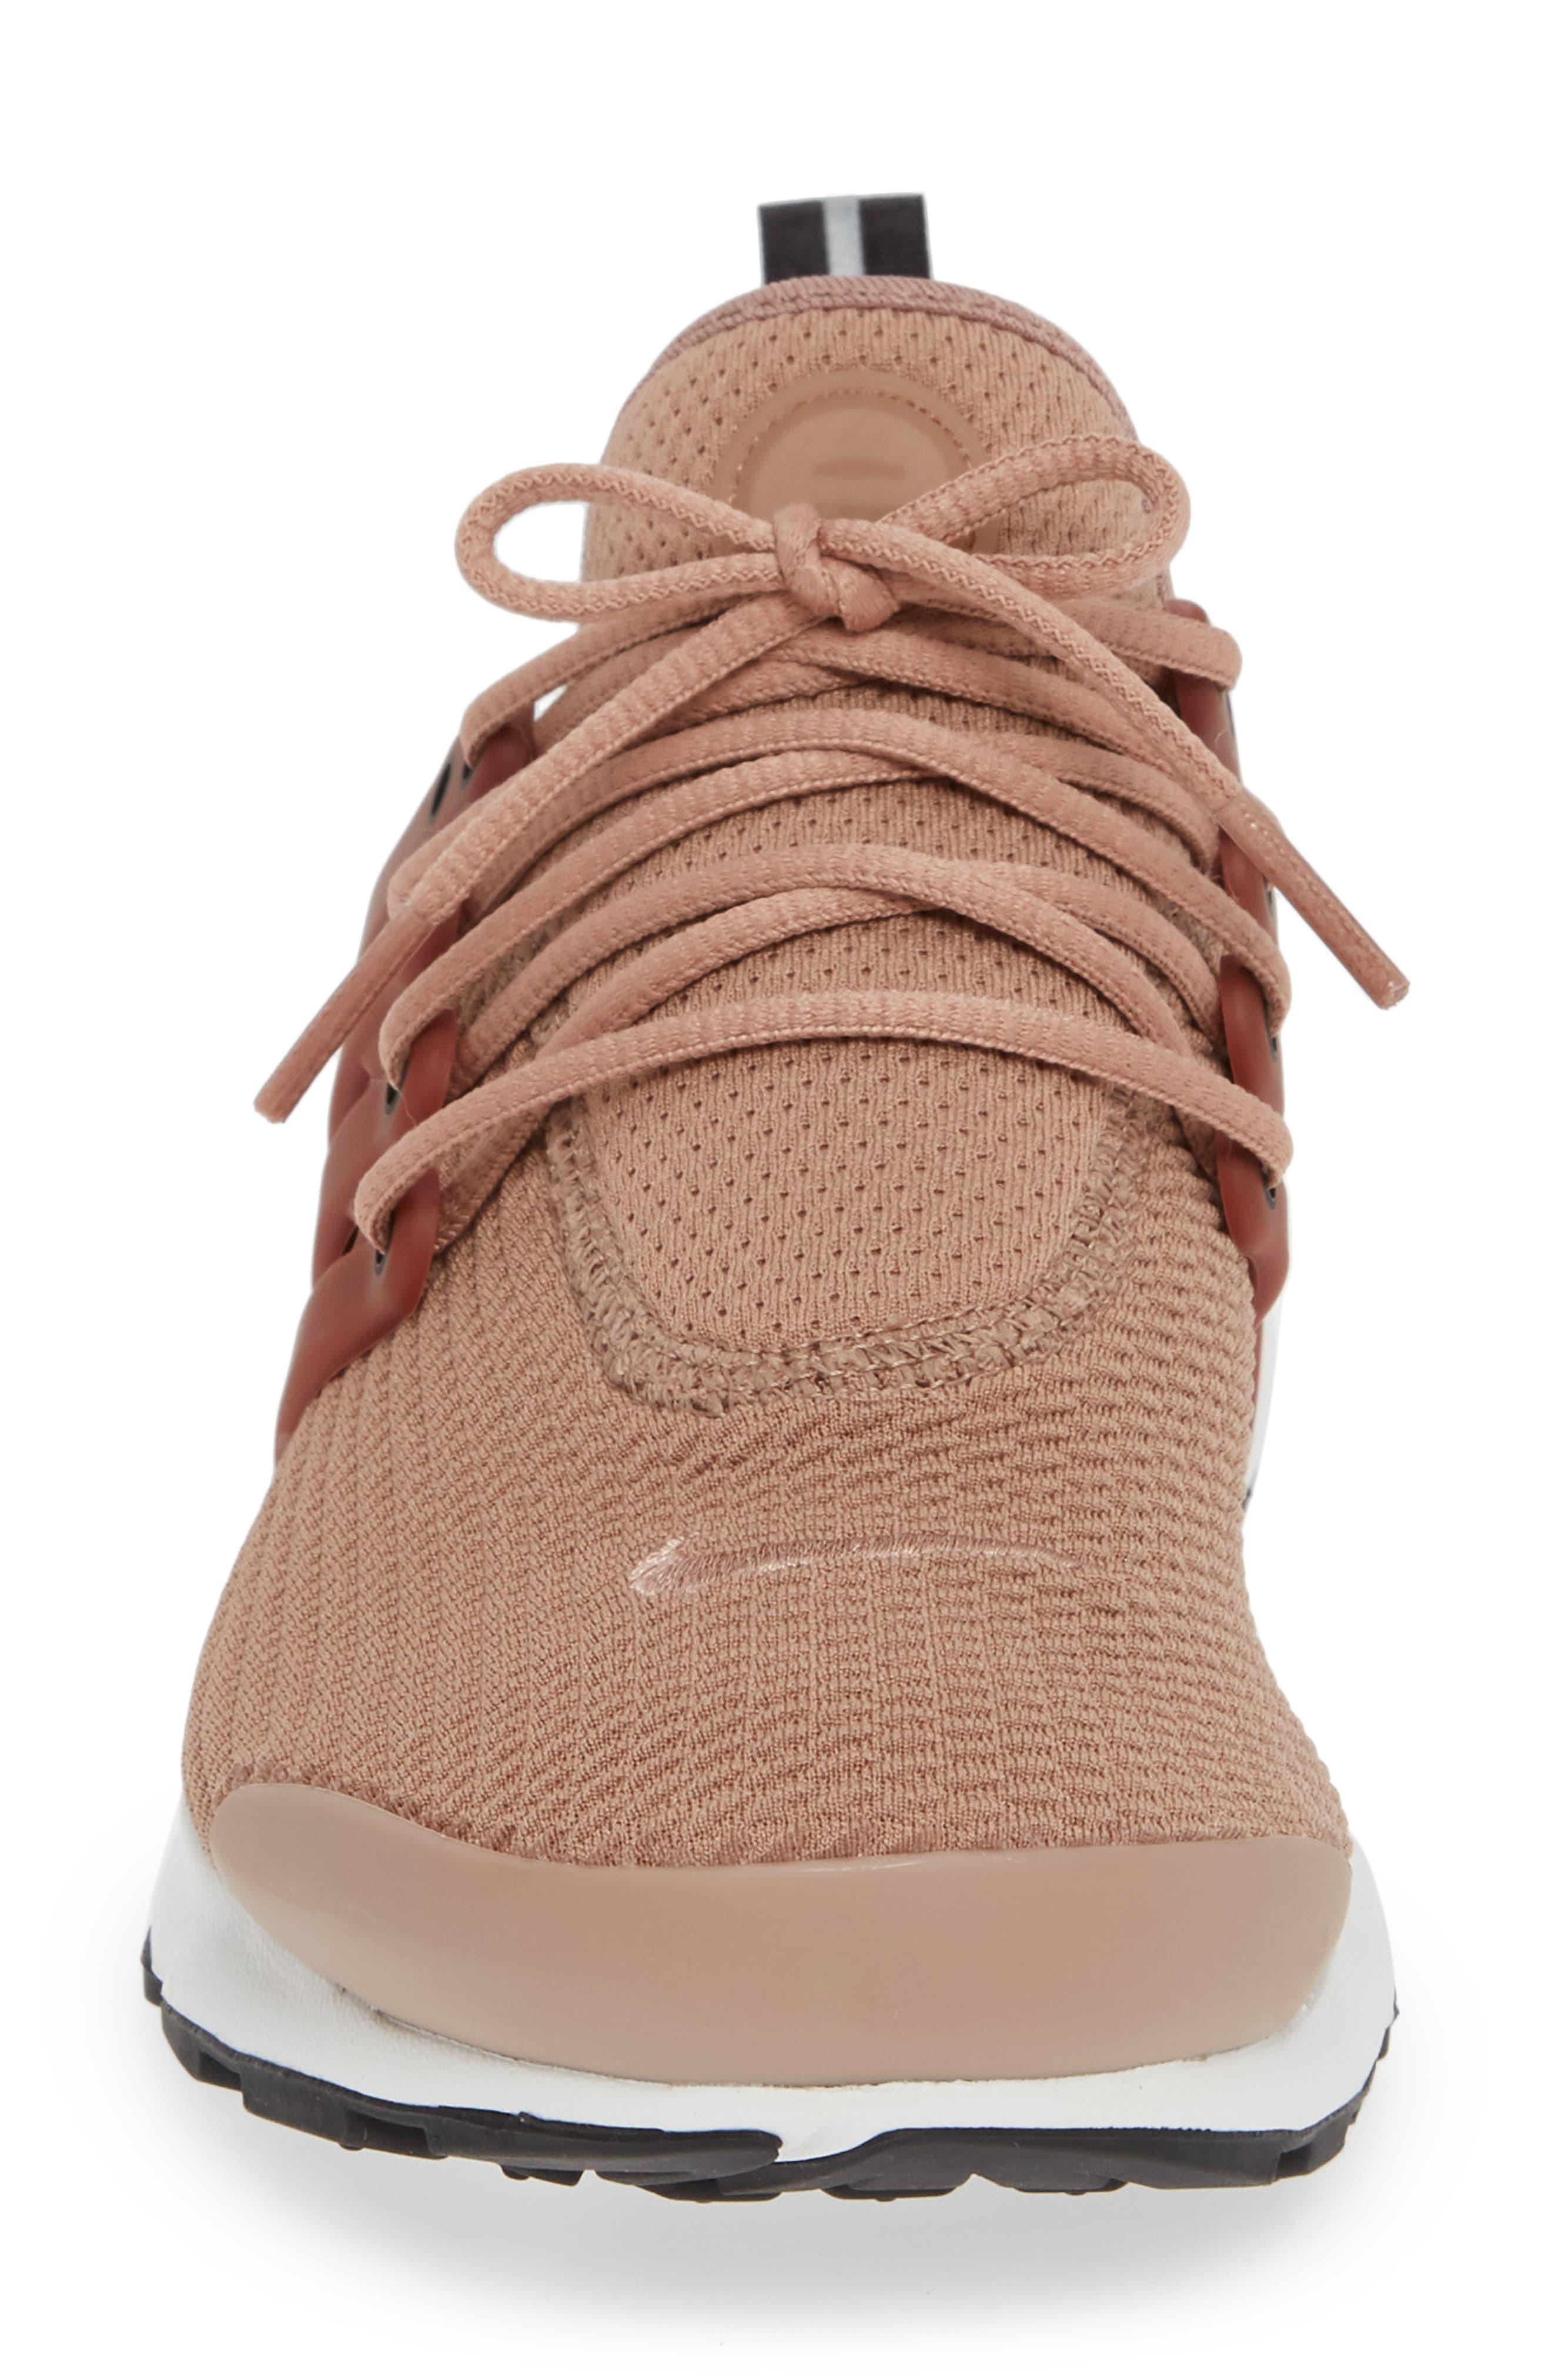 Air Presto Sneaker,                             Alternate thumbnail 4, color,                             251